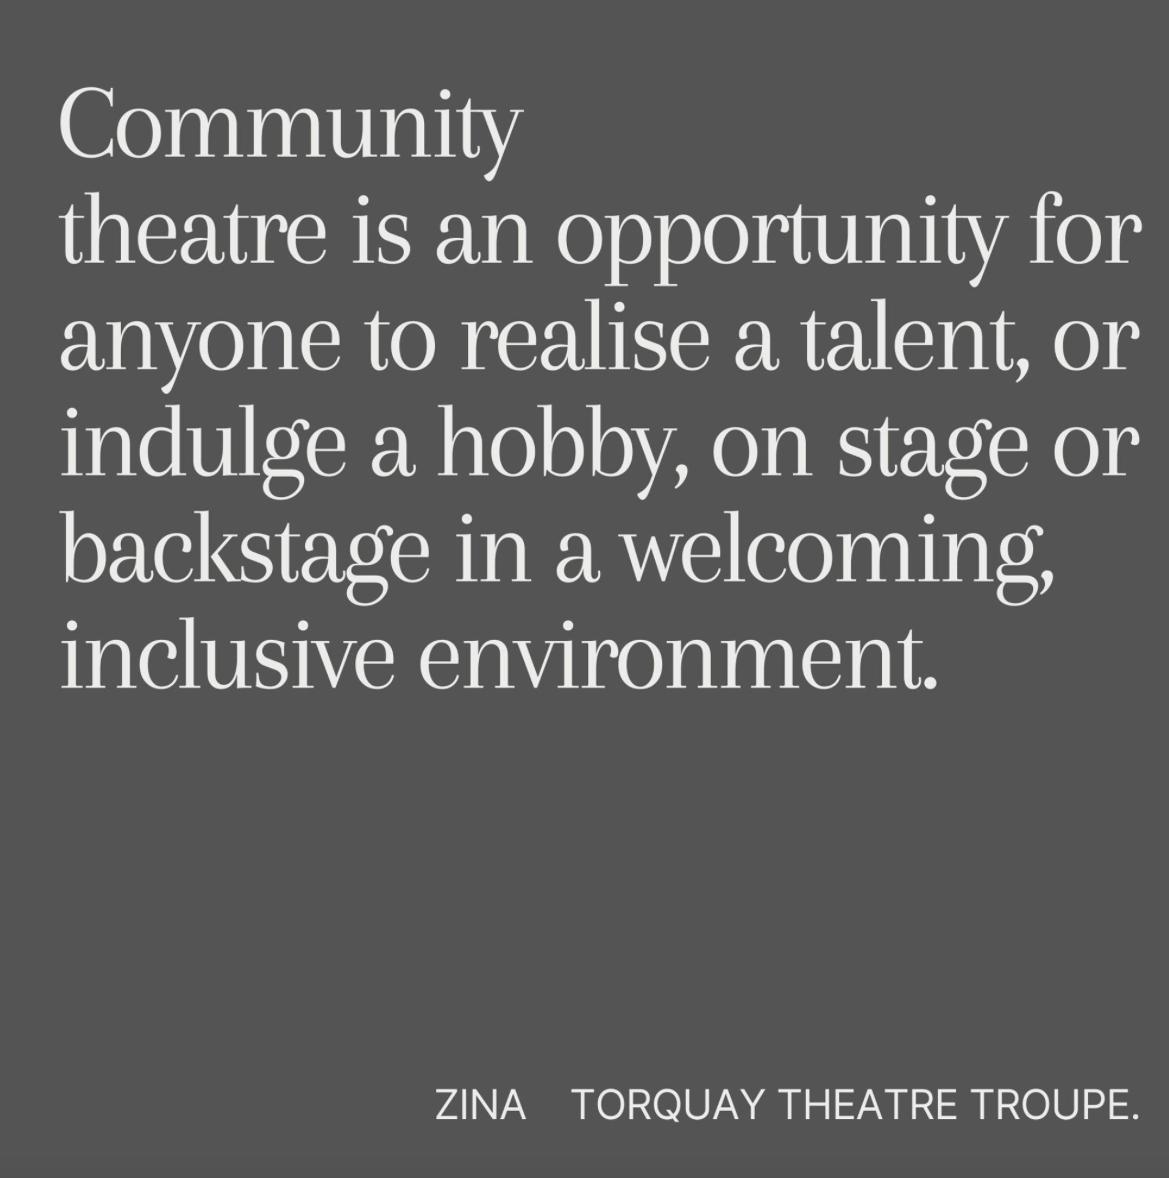 Community theatre is...